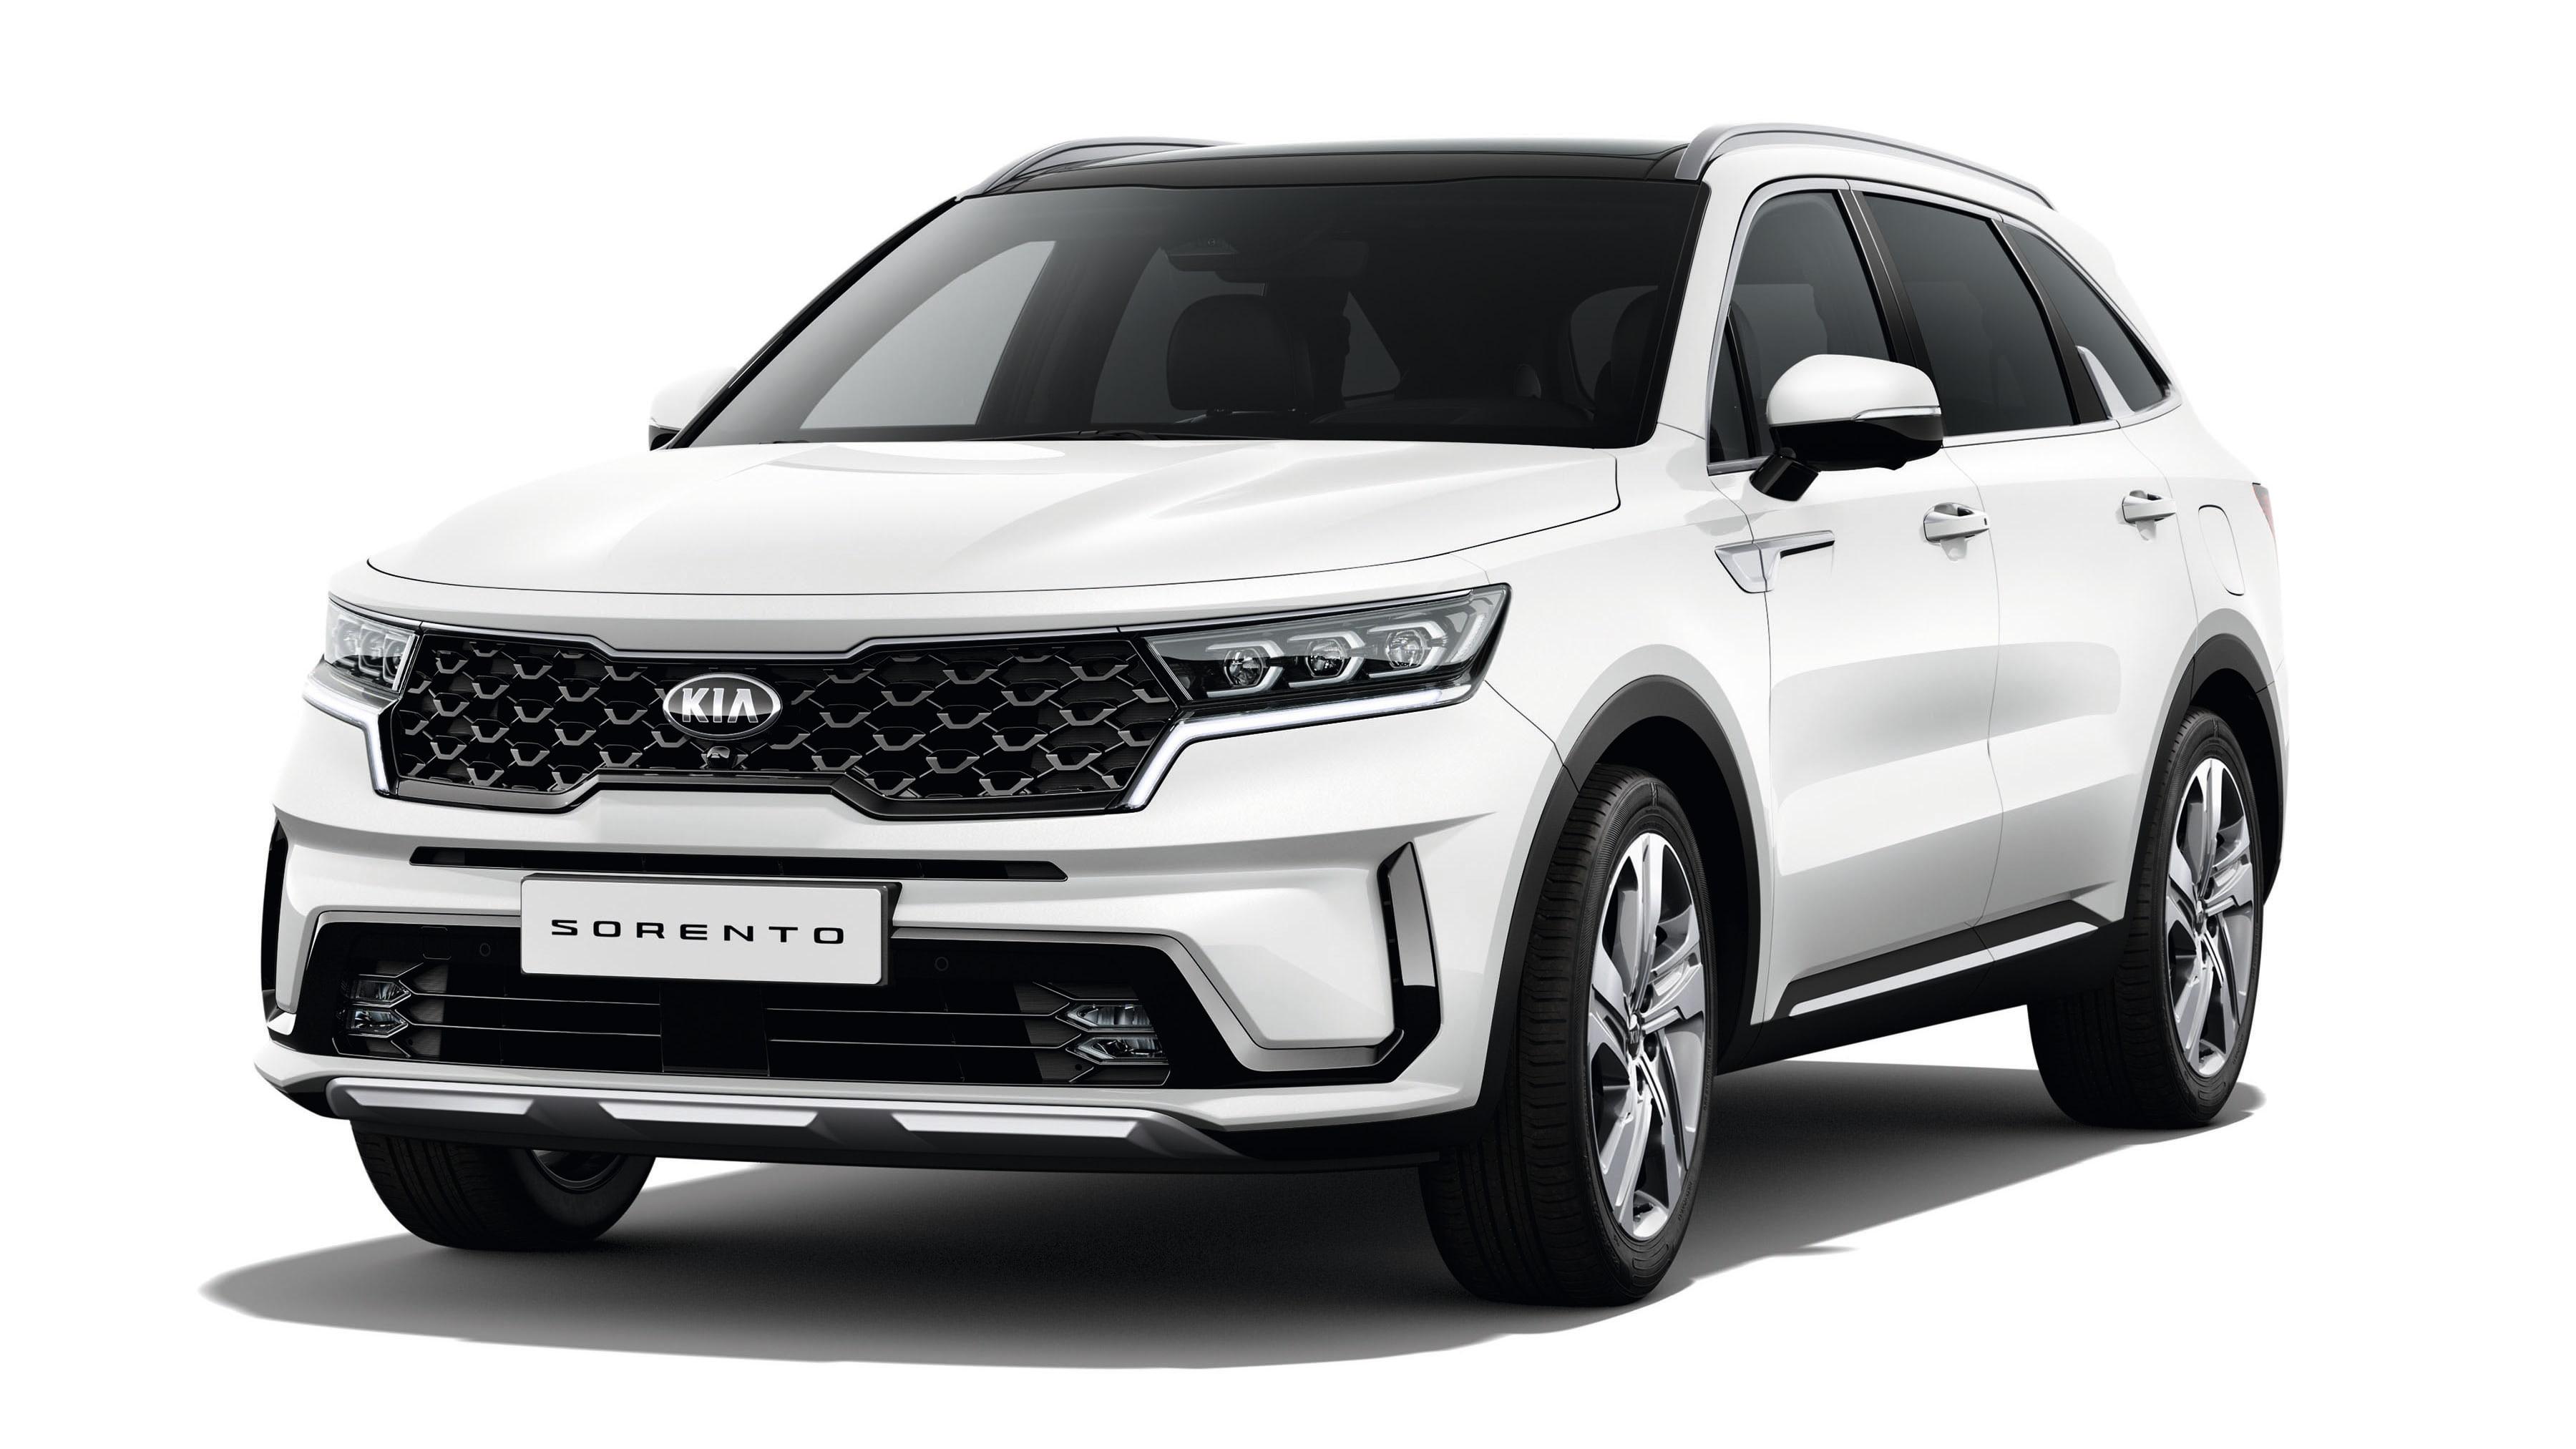 2021 Kia Sorento Price And Specs | Drive Car News